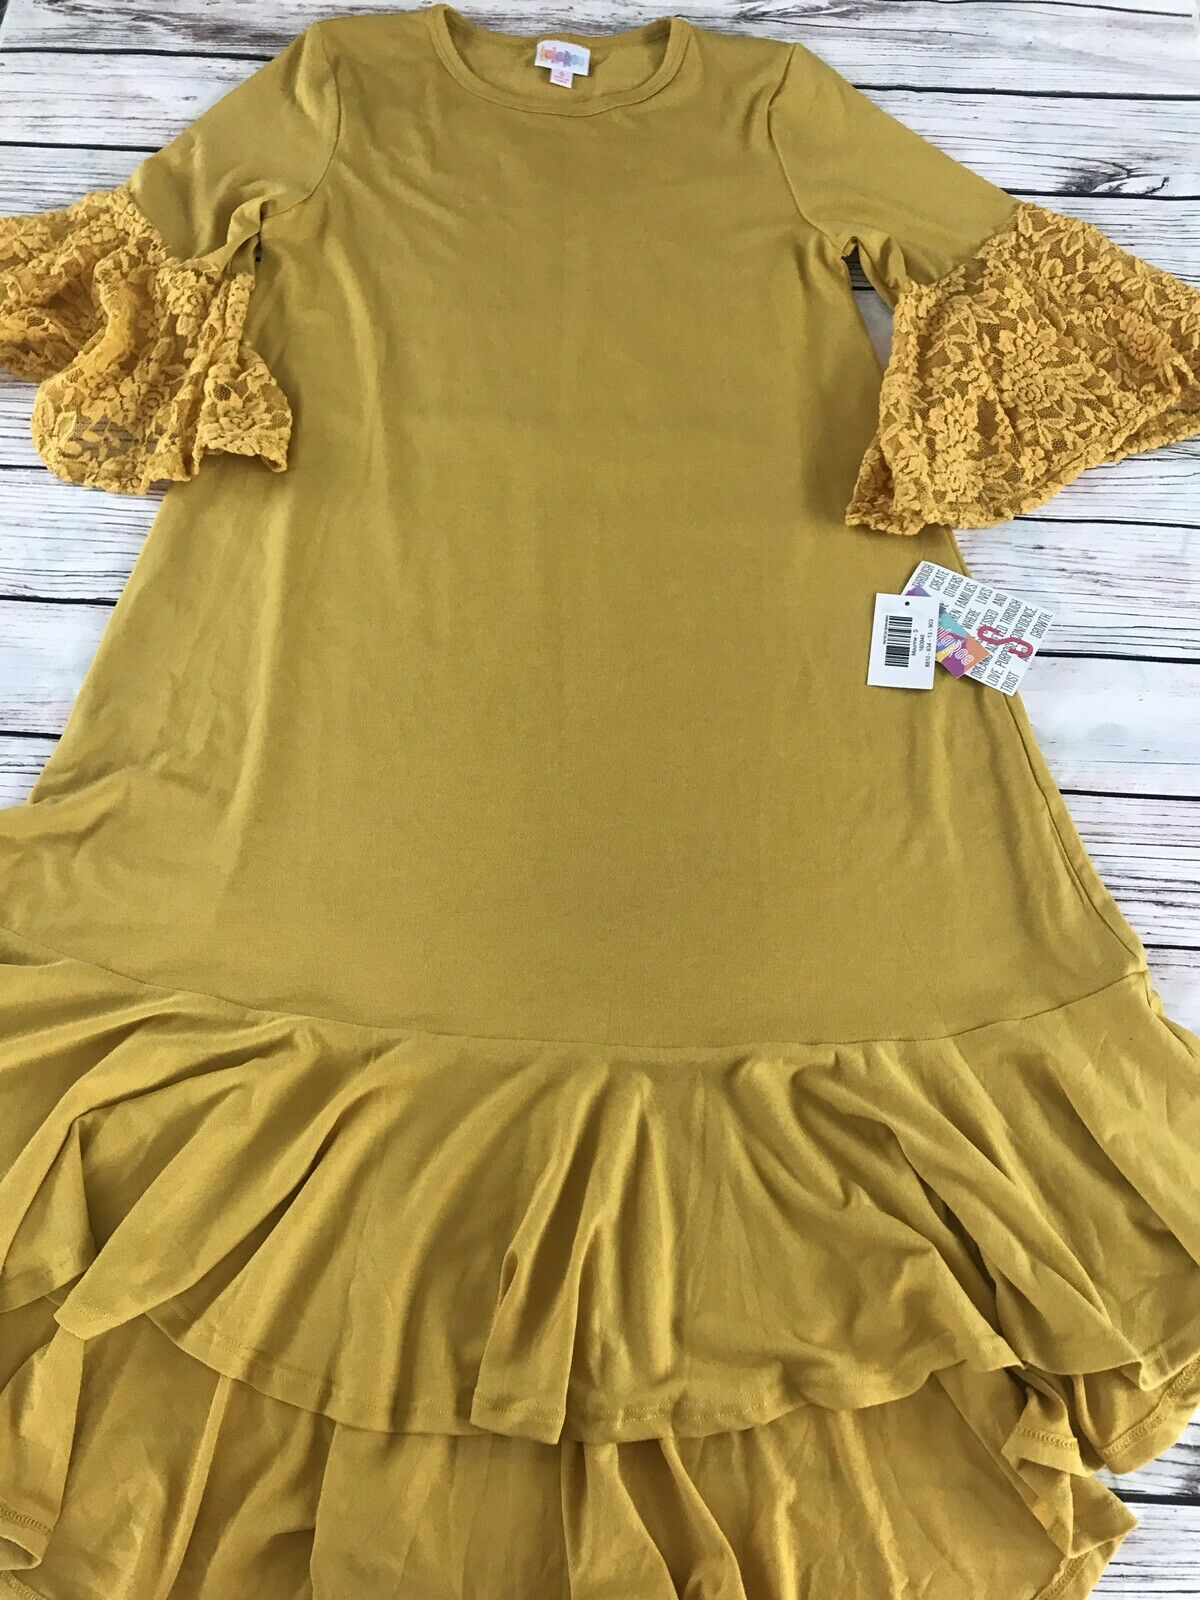 Lularoe NWT Maurine Dress Mustard Yellow Lace Sleeves Small - Rare Beauty